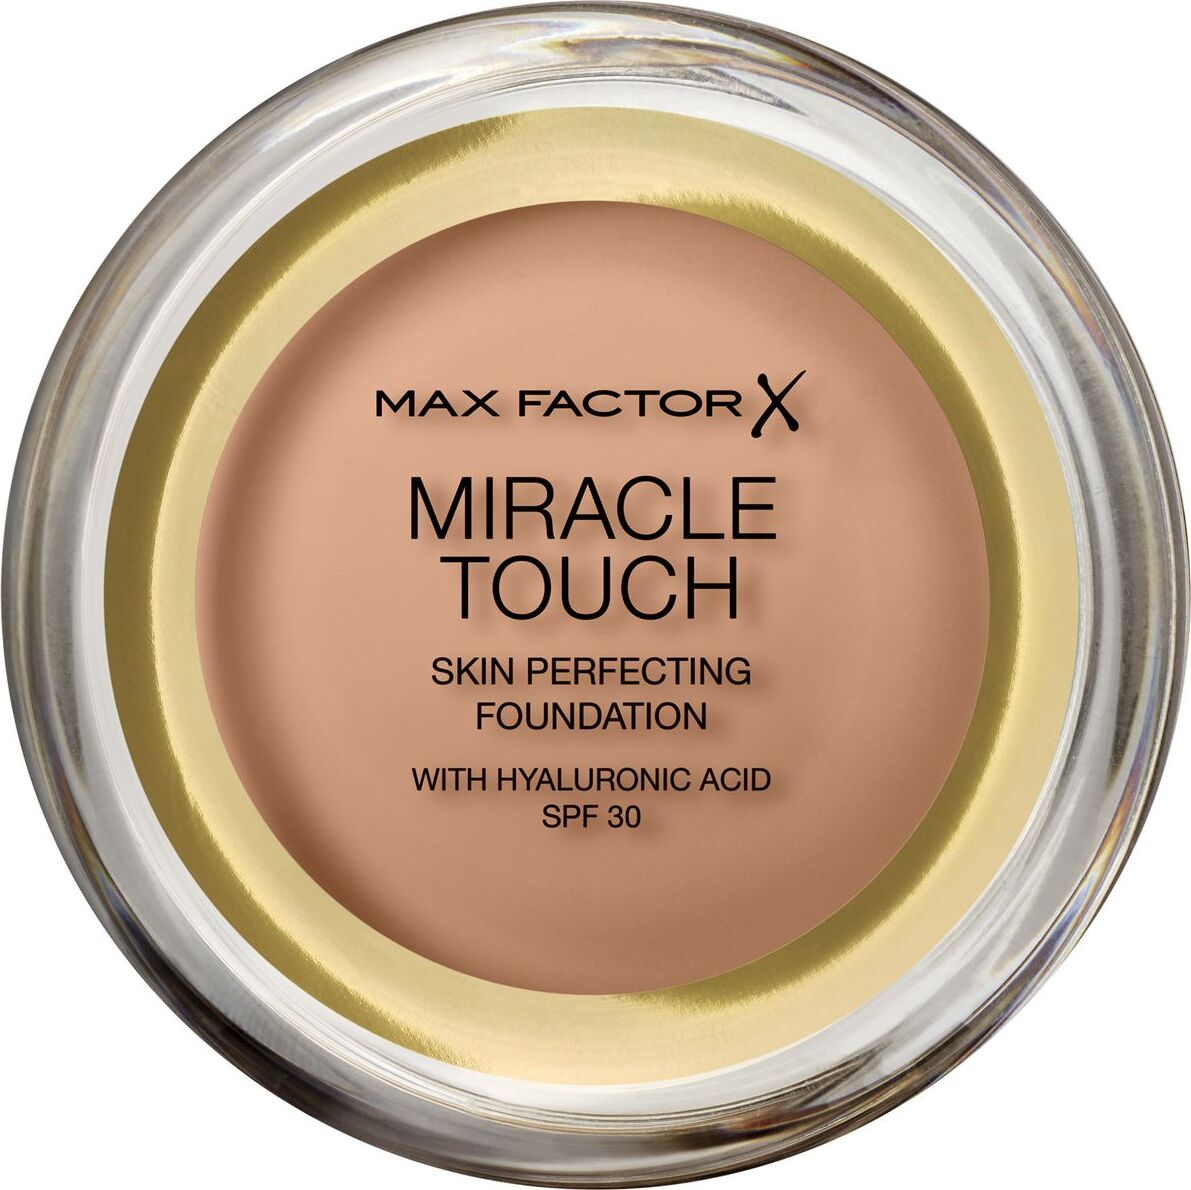 Тональная основа Max Factor Miracle Touch, SPF 30, тон 80 Bronze, 11 мл основа под макияж max factor miracle prep colour correcting cooling тон green 30 мл